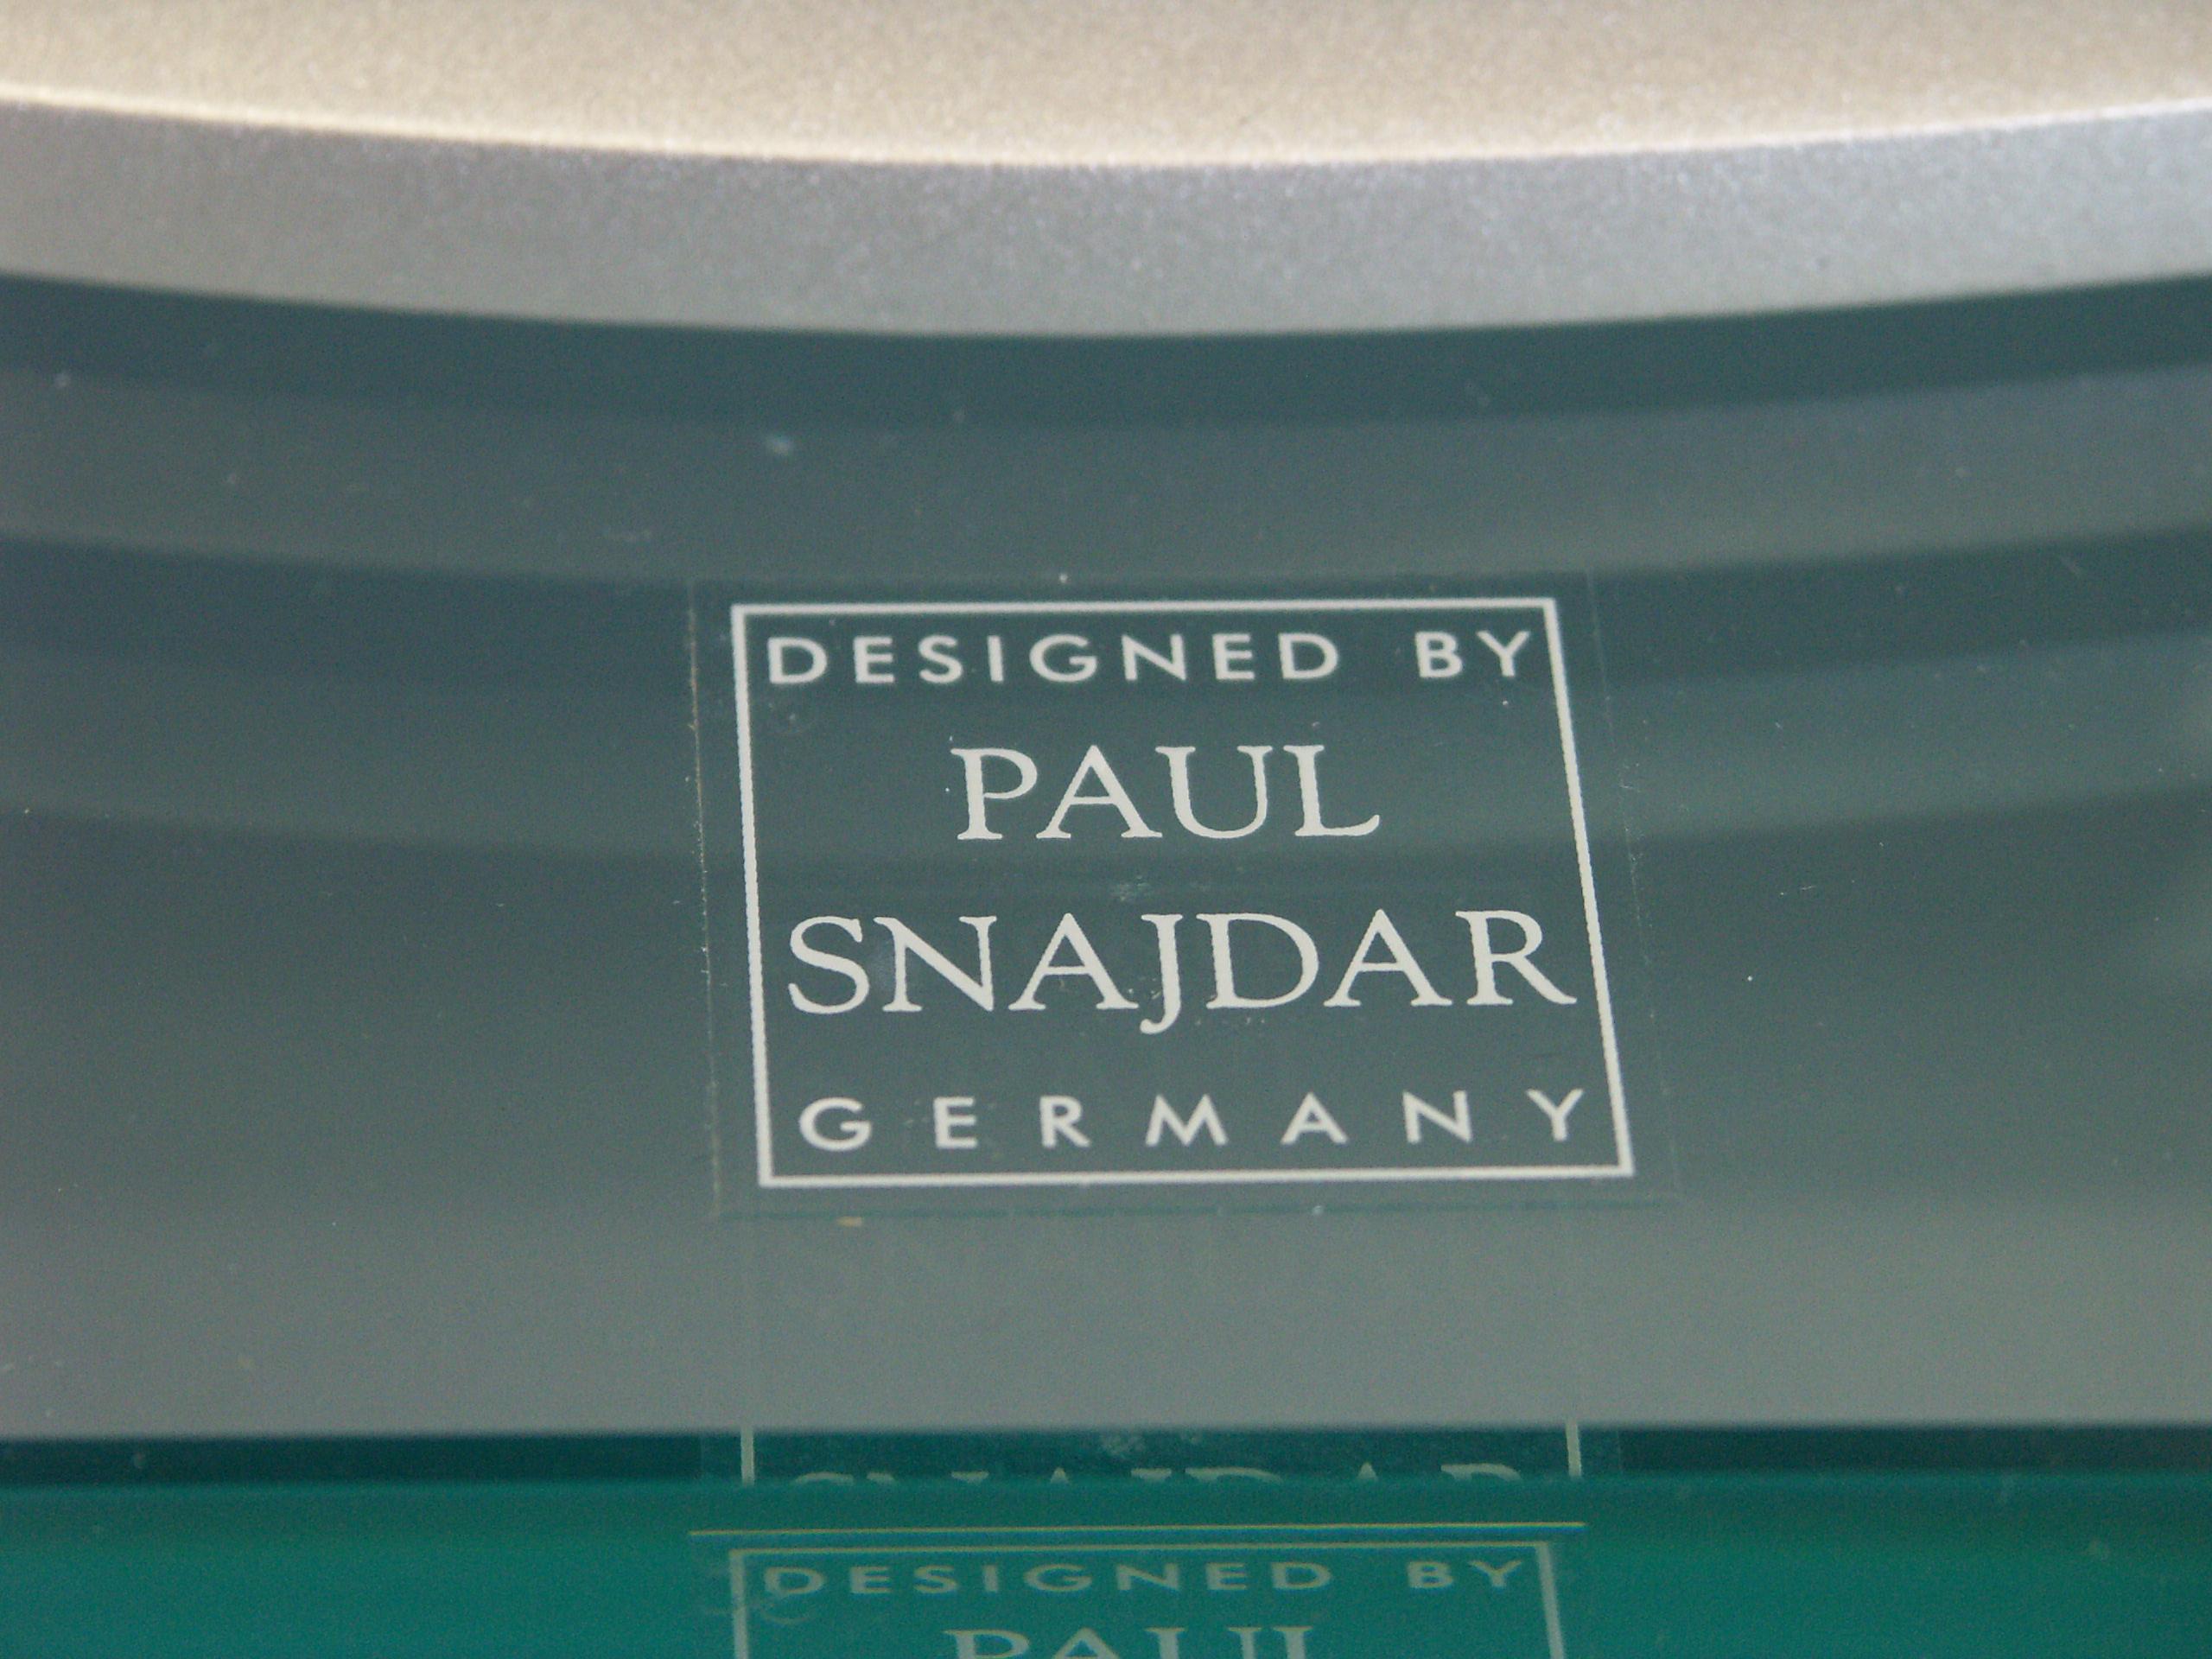 Paul Snajdar